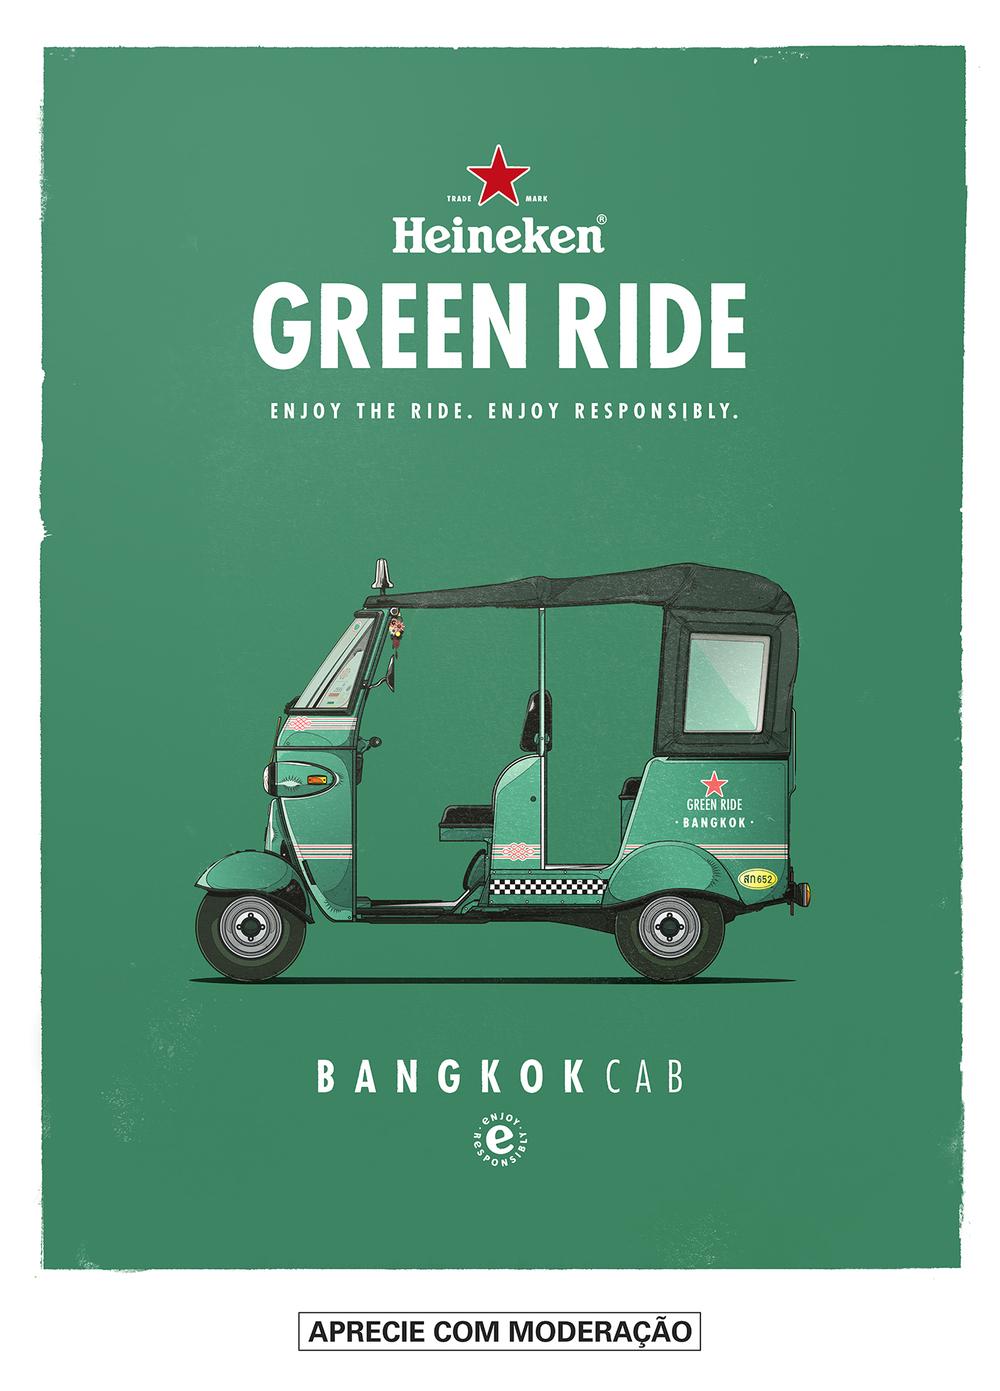 IFR_43644_018_Bangkok_Poster.jpg